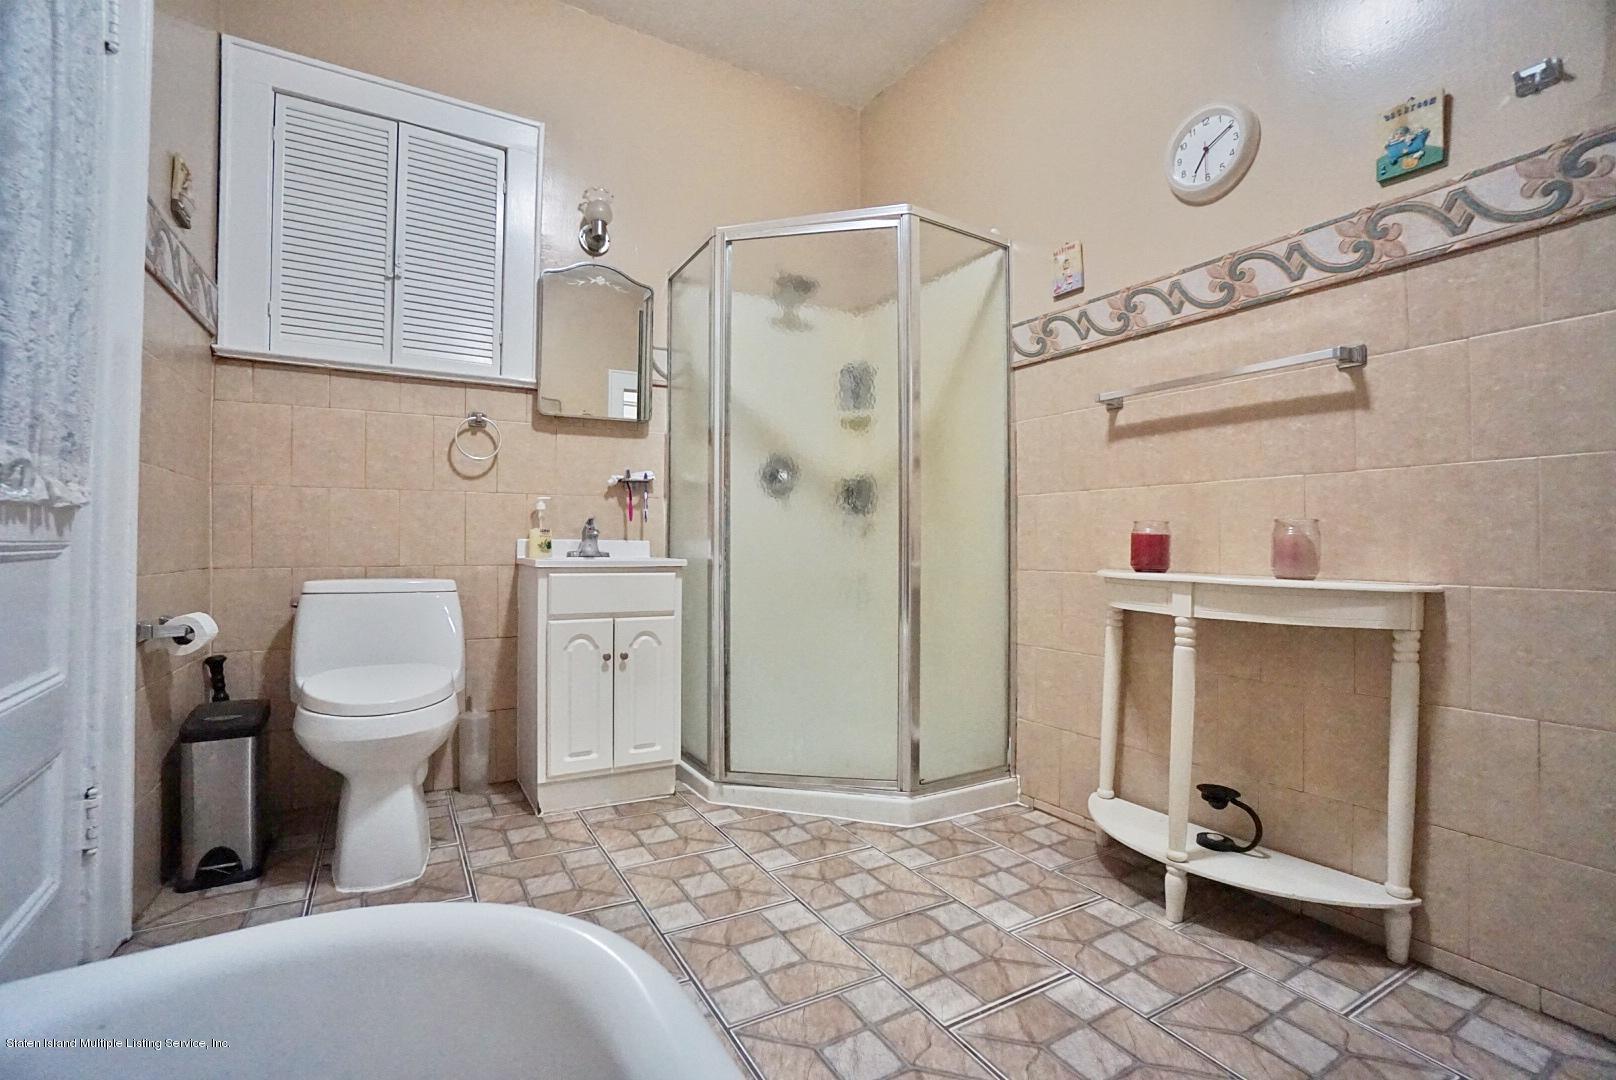 Single Family - Detached 31 Pelton Avenue  Staten Island, NY 10310, MLS-1132177-18